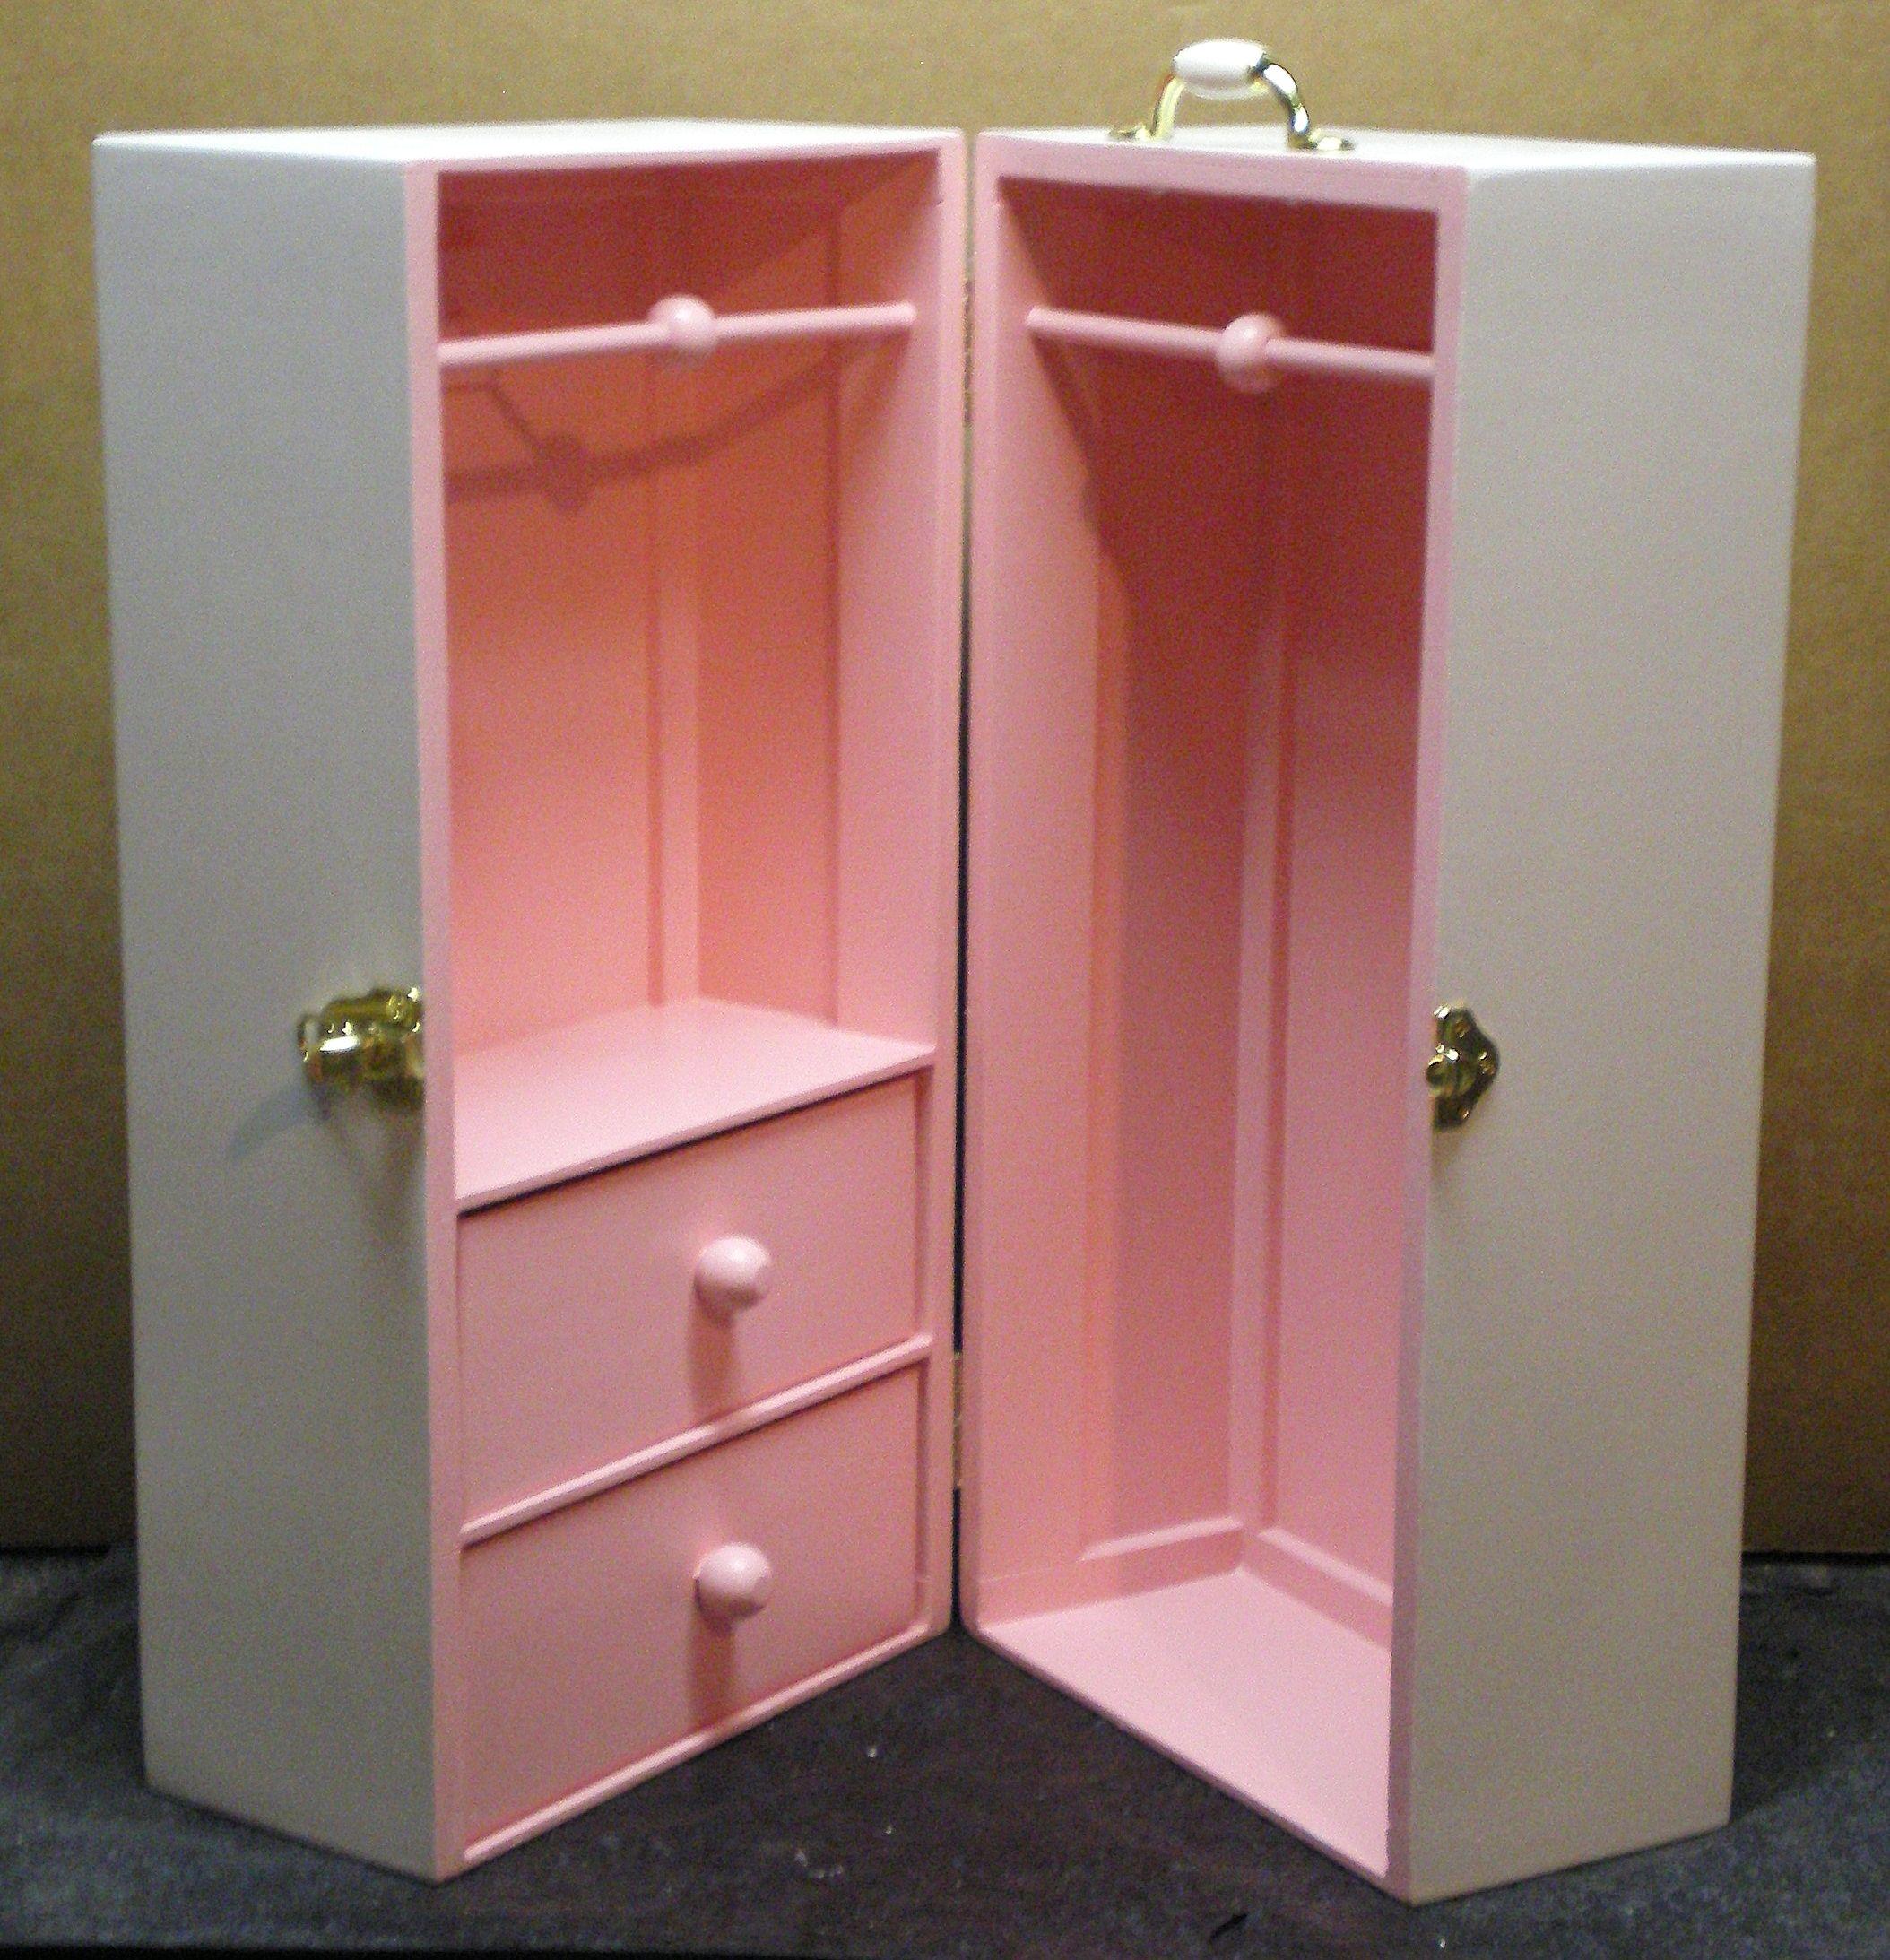 SEWSATIONS DOLL FURNITURE doll house furniture Pinterest